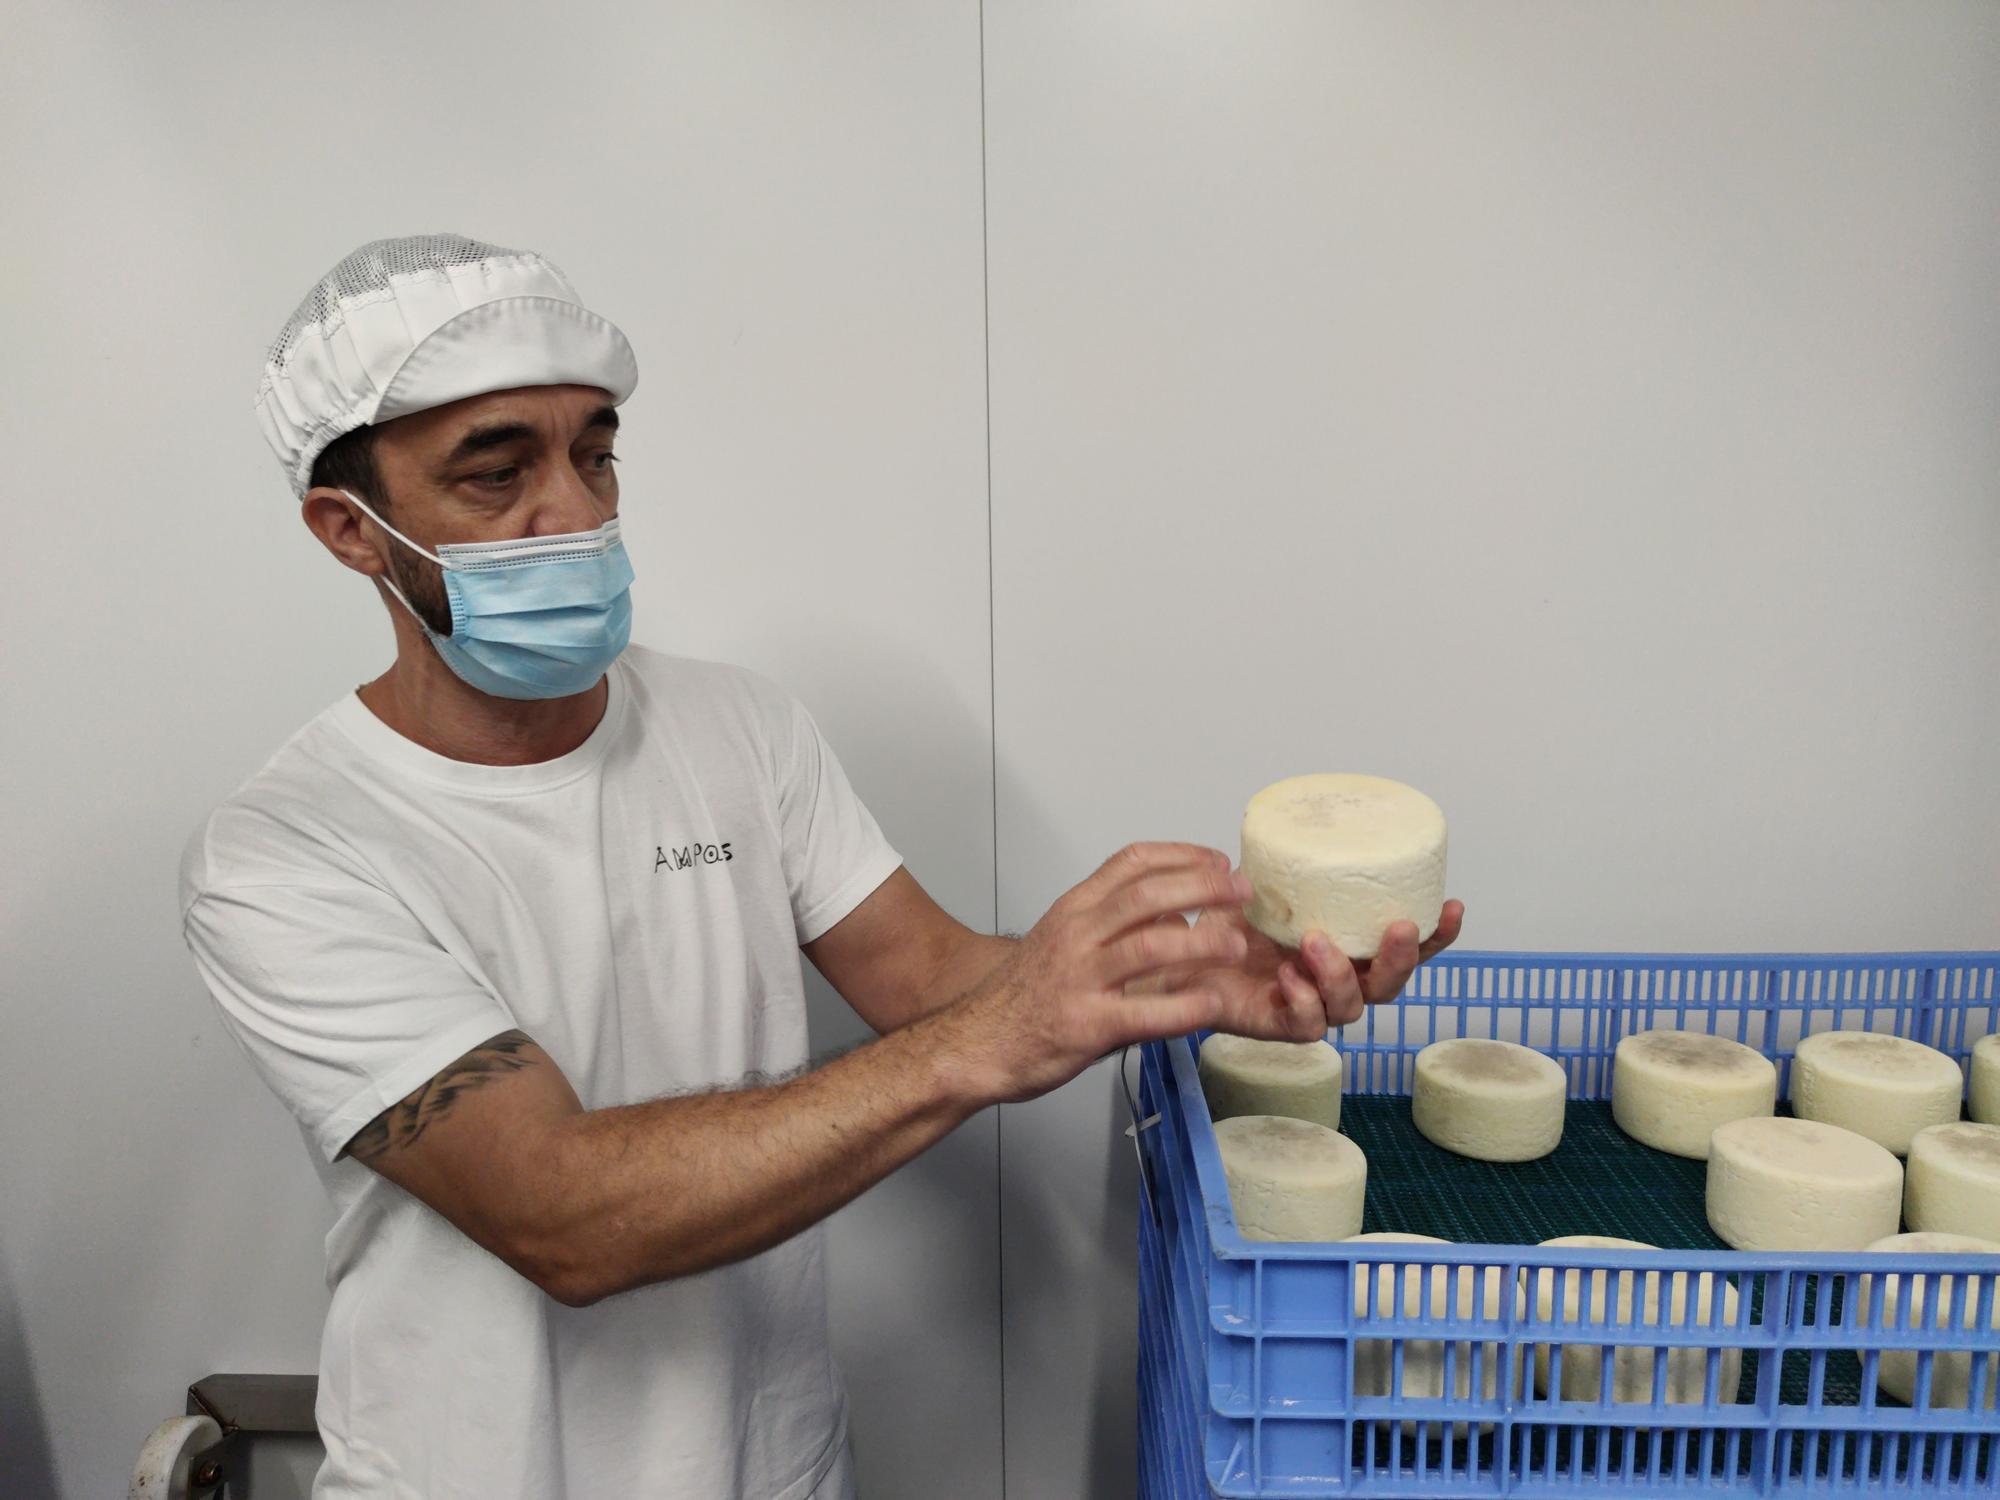 Ampansrenova la imatge de marca de la formatgeria Montanyola